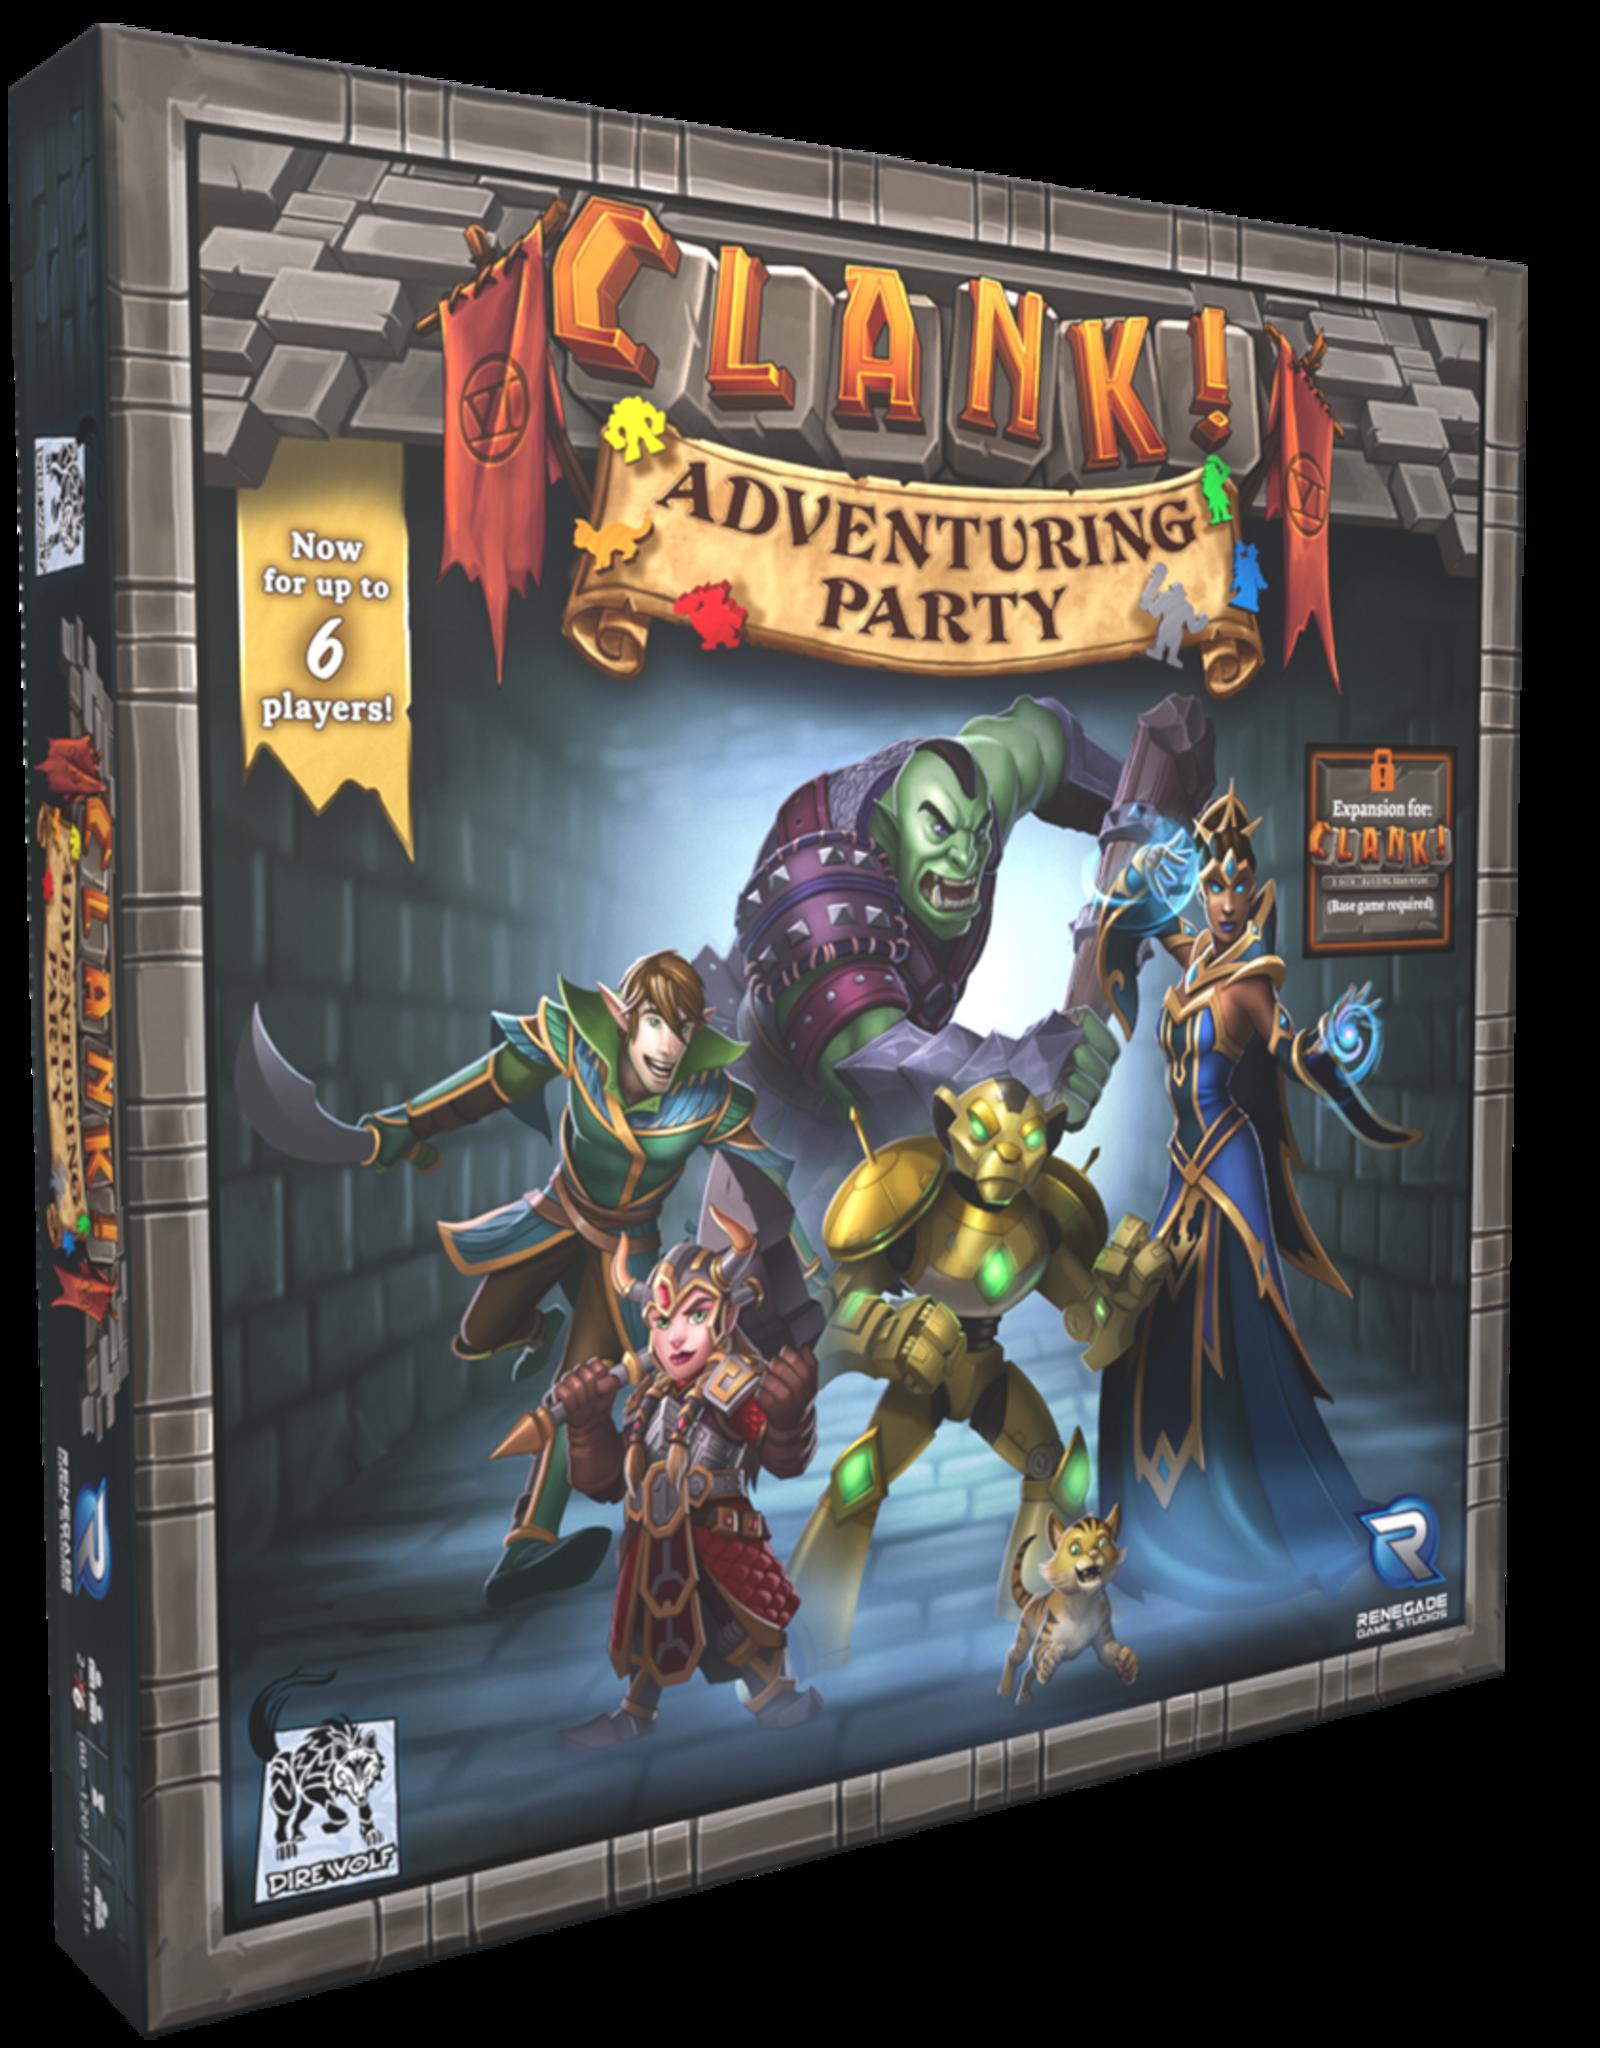 Renegade Games Clank! Adventuring Party Arriving (EN)